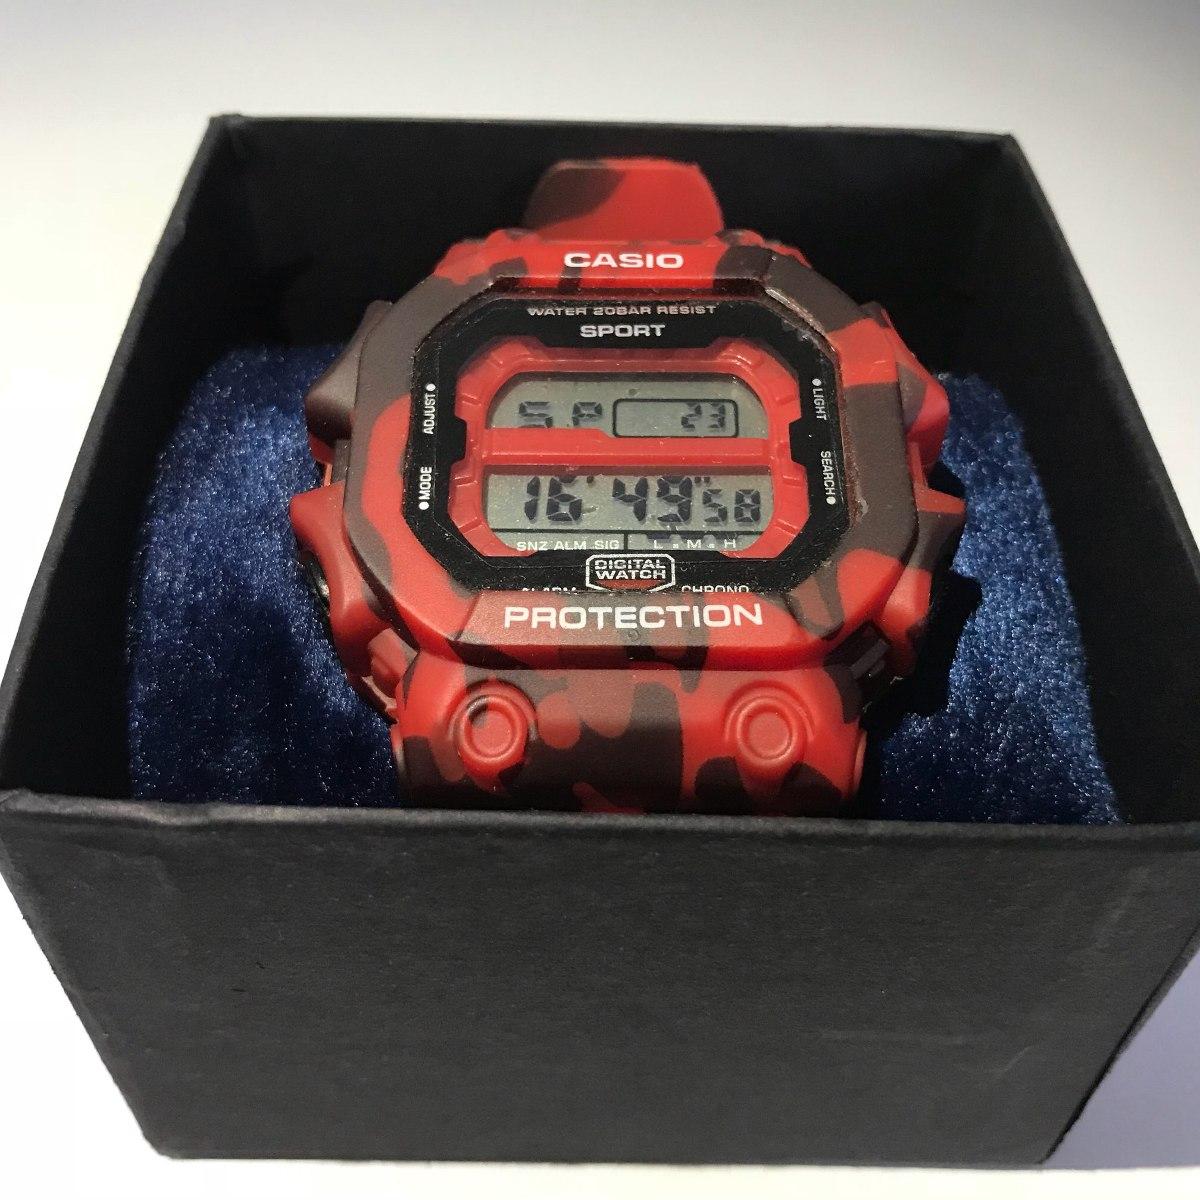 96059fdd884 relógio casio sport protection. Carregando zoom.